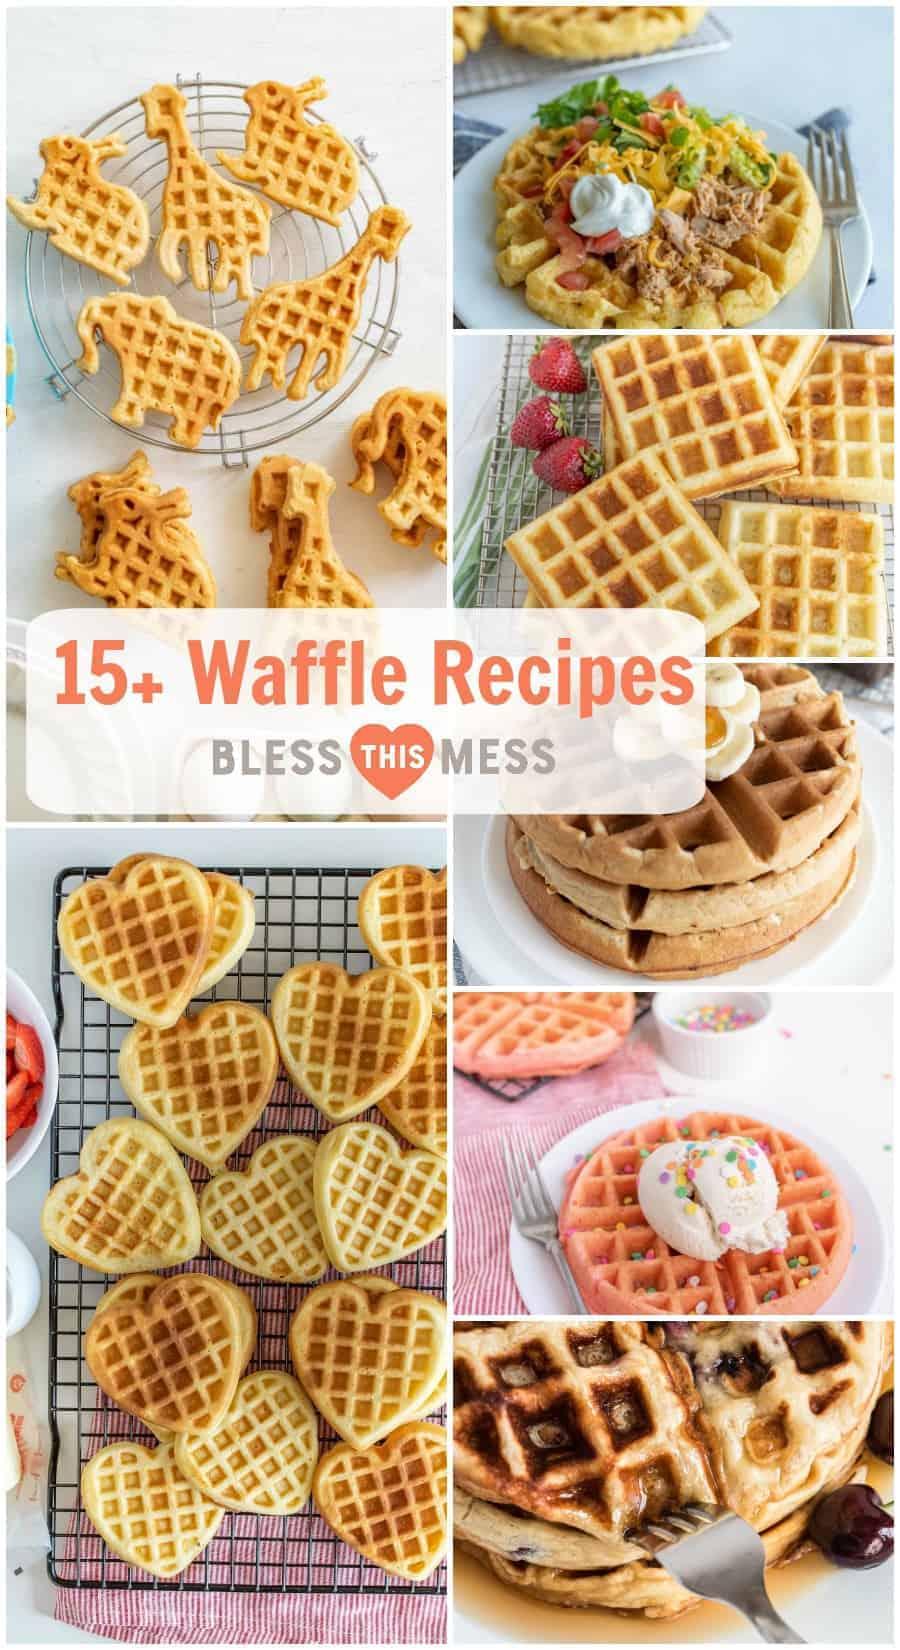 Image of 7 Delicious Waffle Recipe Ideas